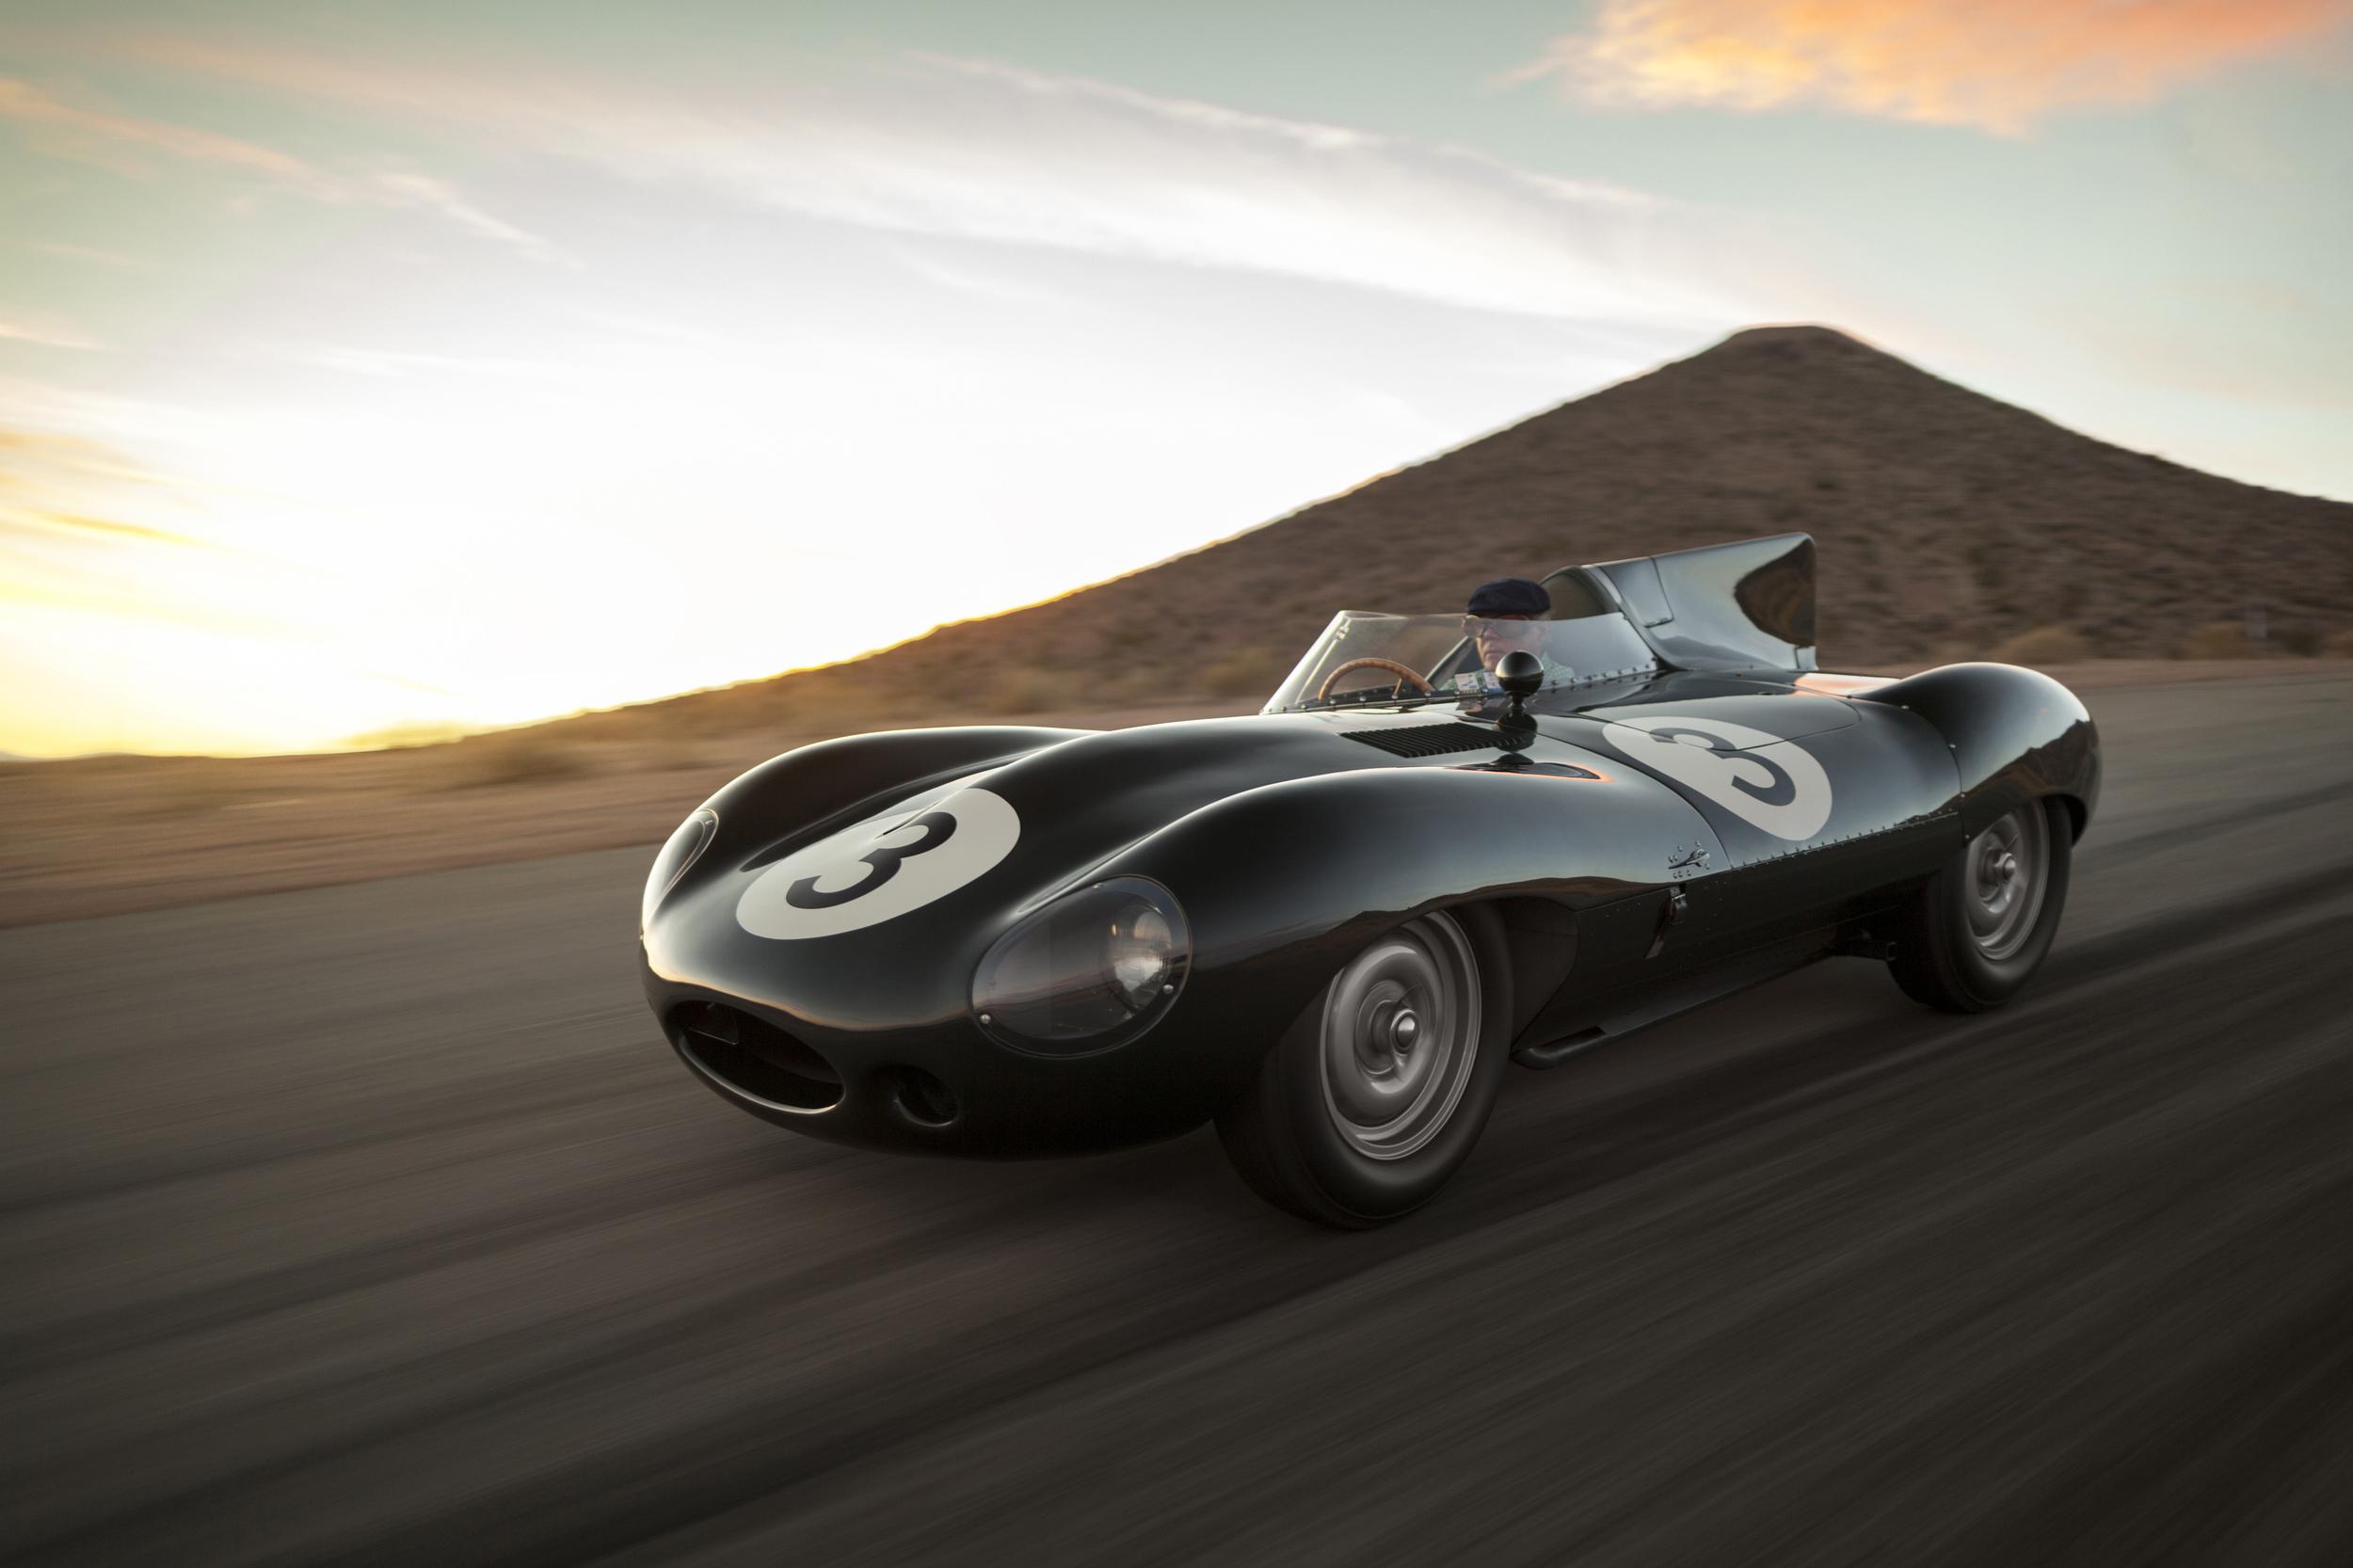 Racing Car Wallpaper 1080p For Auction Rare 1956 Jaguar D Type Works Long Nose